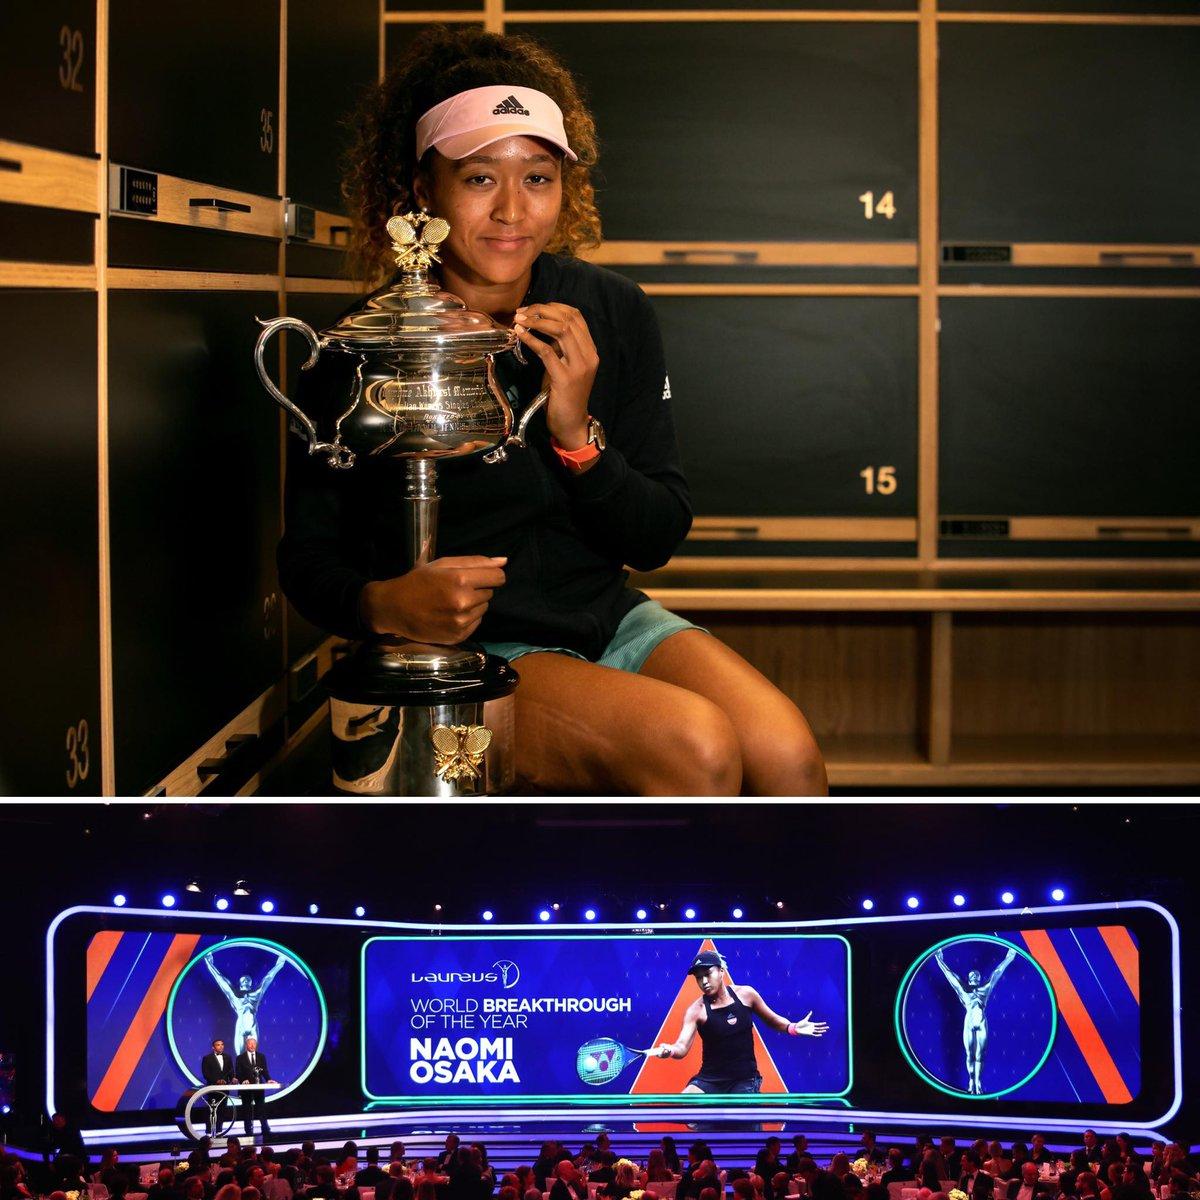 Breakthrough of the Year 🙌   Congratulations @Naomi_Osaka_ on your first @LaureusSport award. #AusOpen #Laureus19